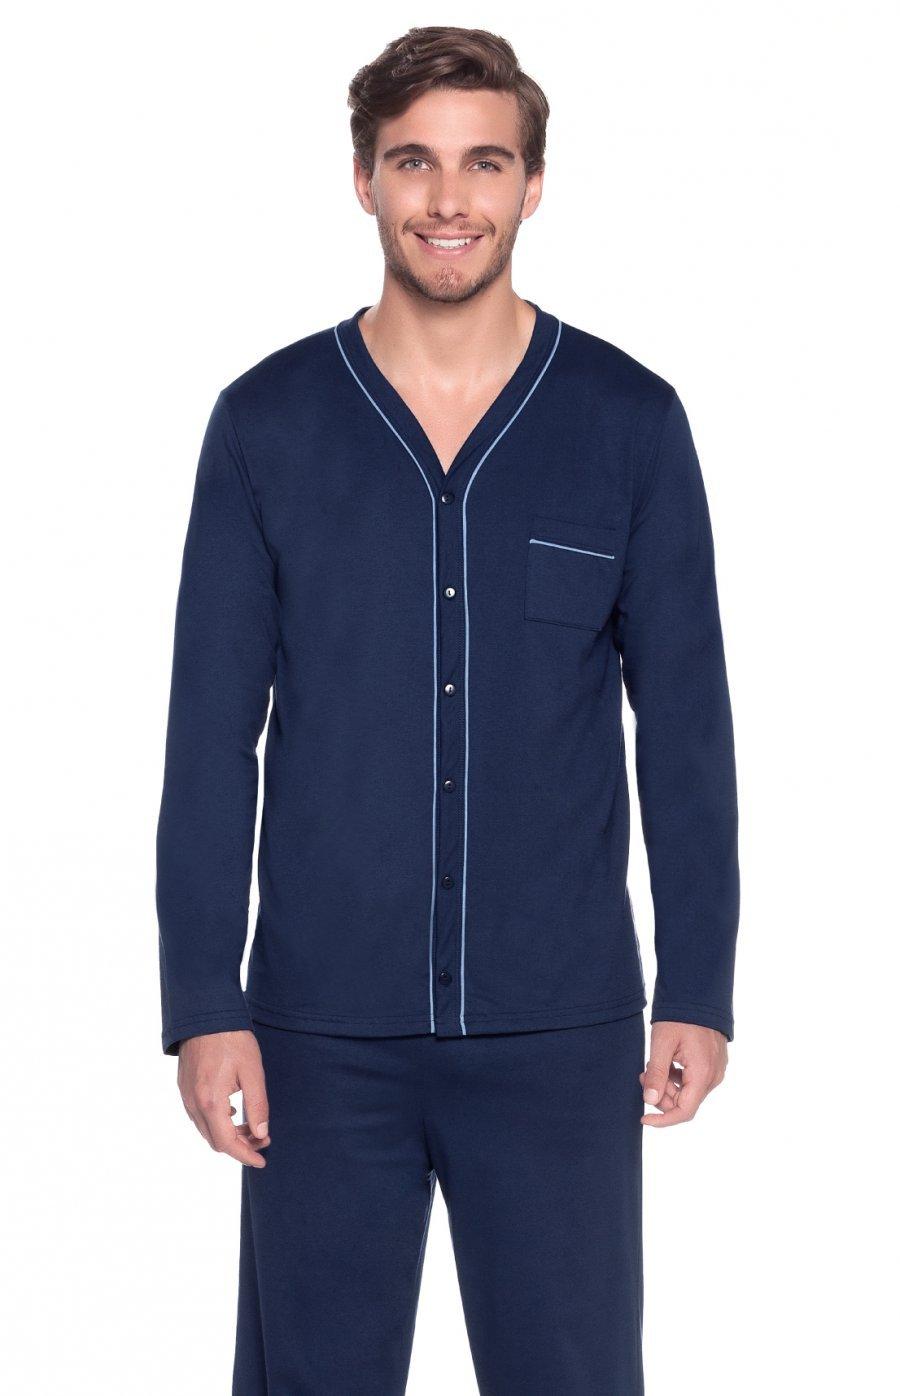 Pijama Masculino 100% Algodão Blue Inverno 2017